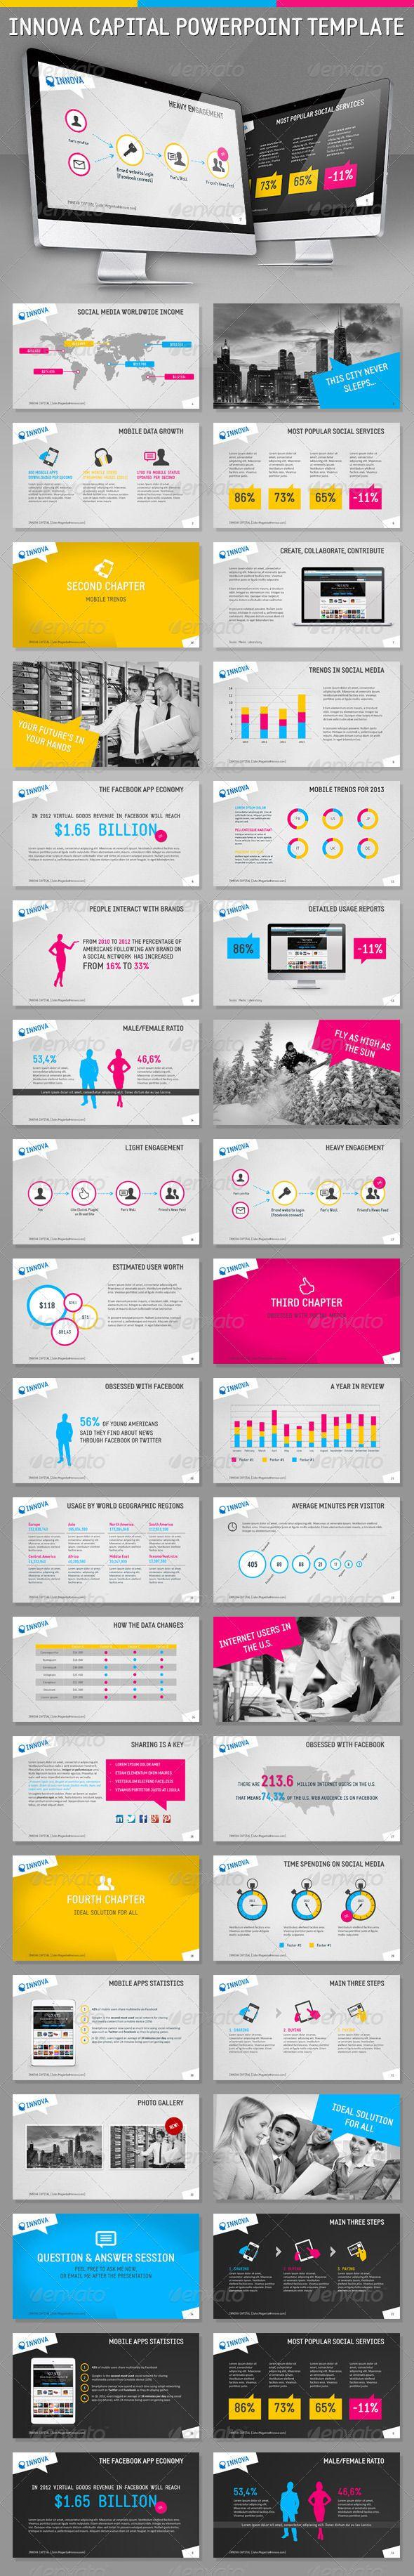 Innova Capital HD PowerPoint Template - Powerpoint Templates Presentation Templates